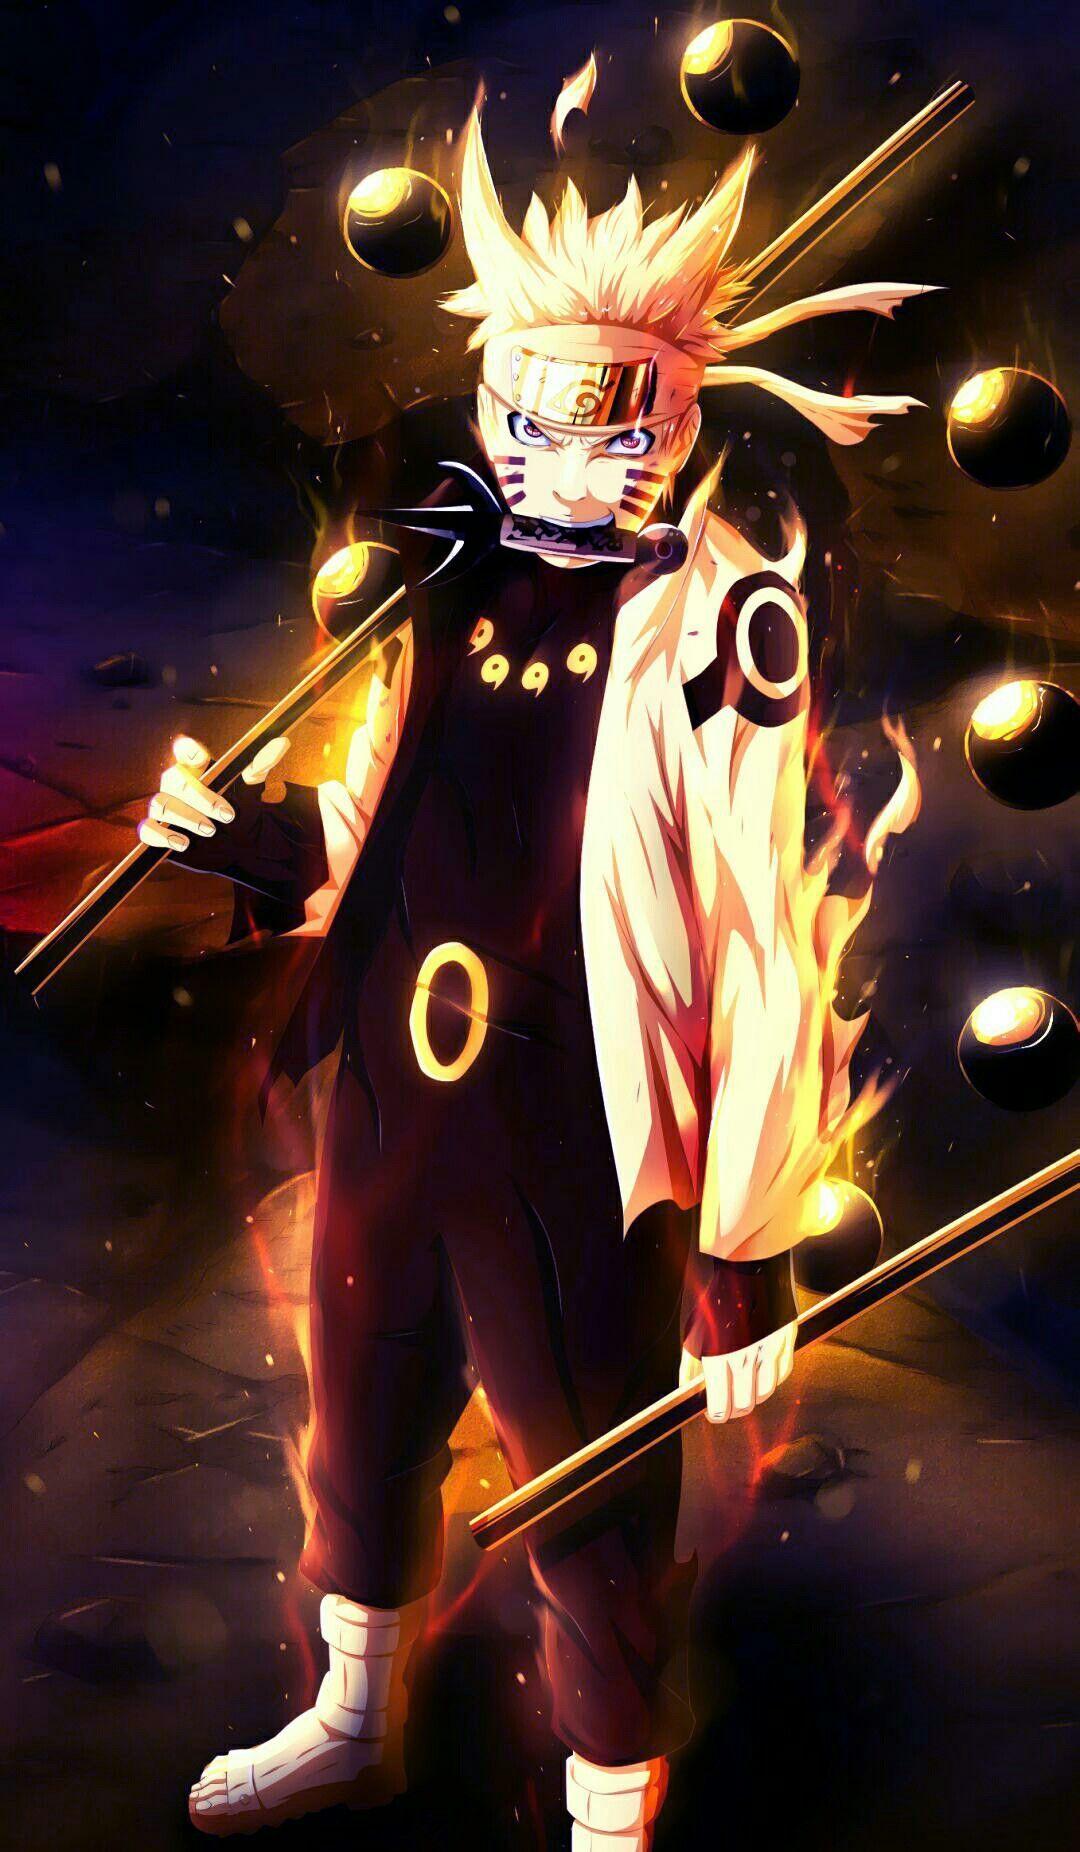 Pin de Elza prasitta Prasitta em Naruto Anime naruto